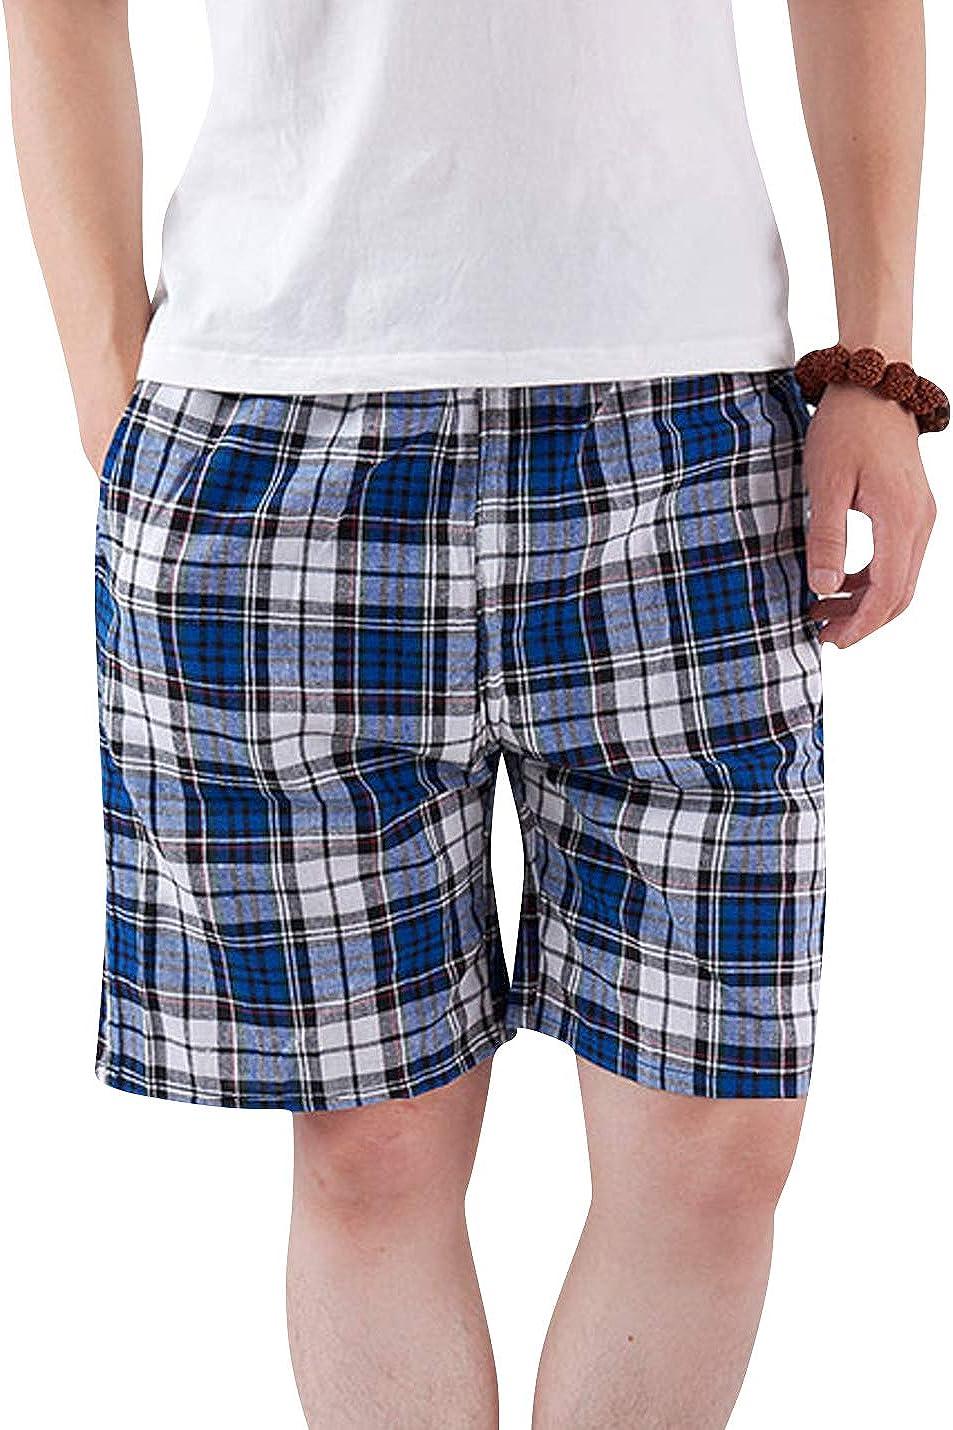 ZGZZ7 Men's Lightweight Casual Pajama Short Checkered Lounge Sleepwear Pjs Nightwear Shorts